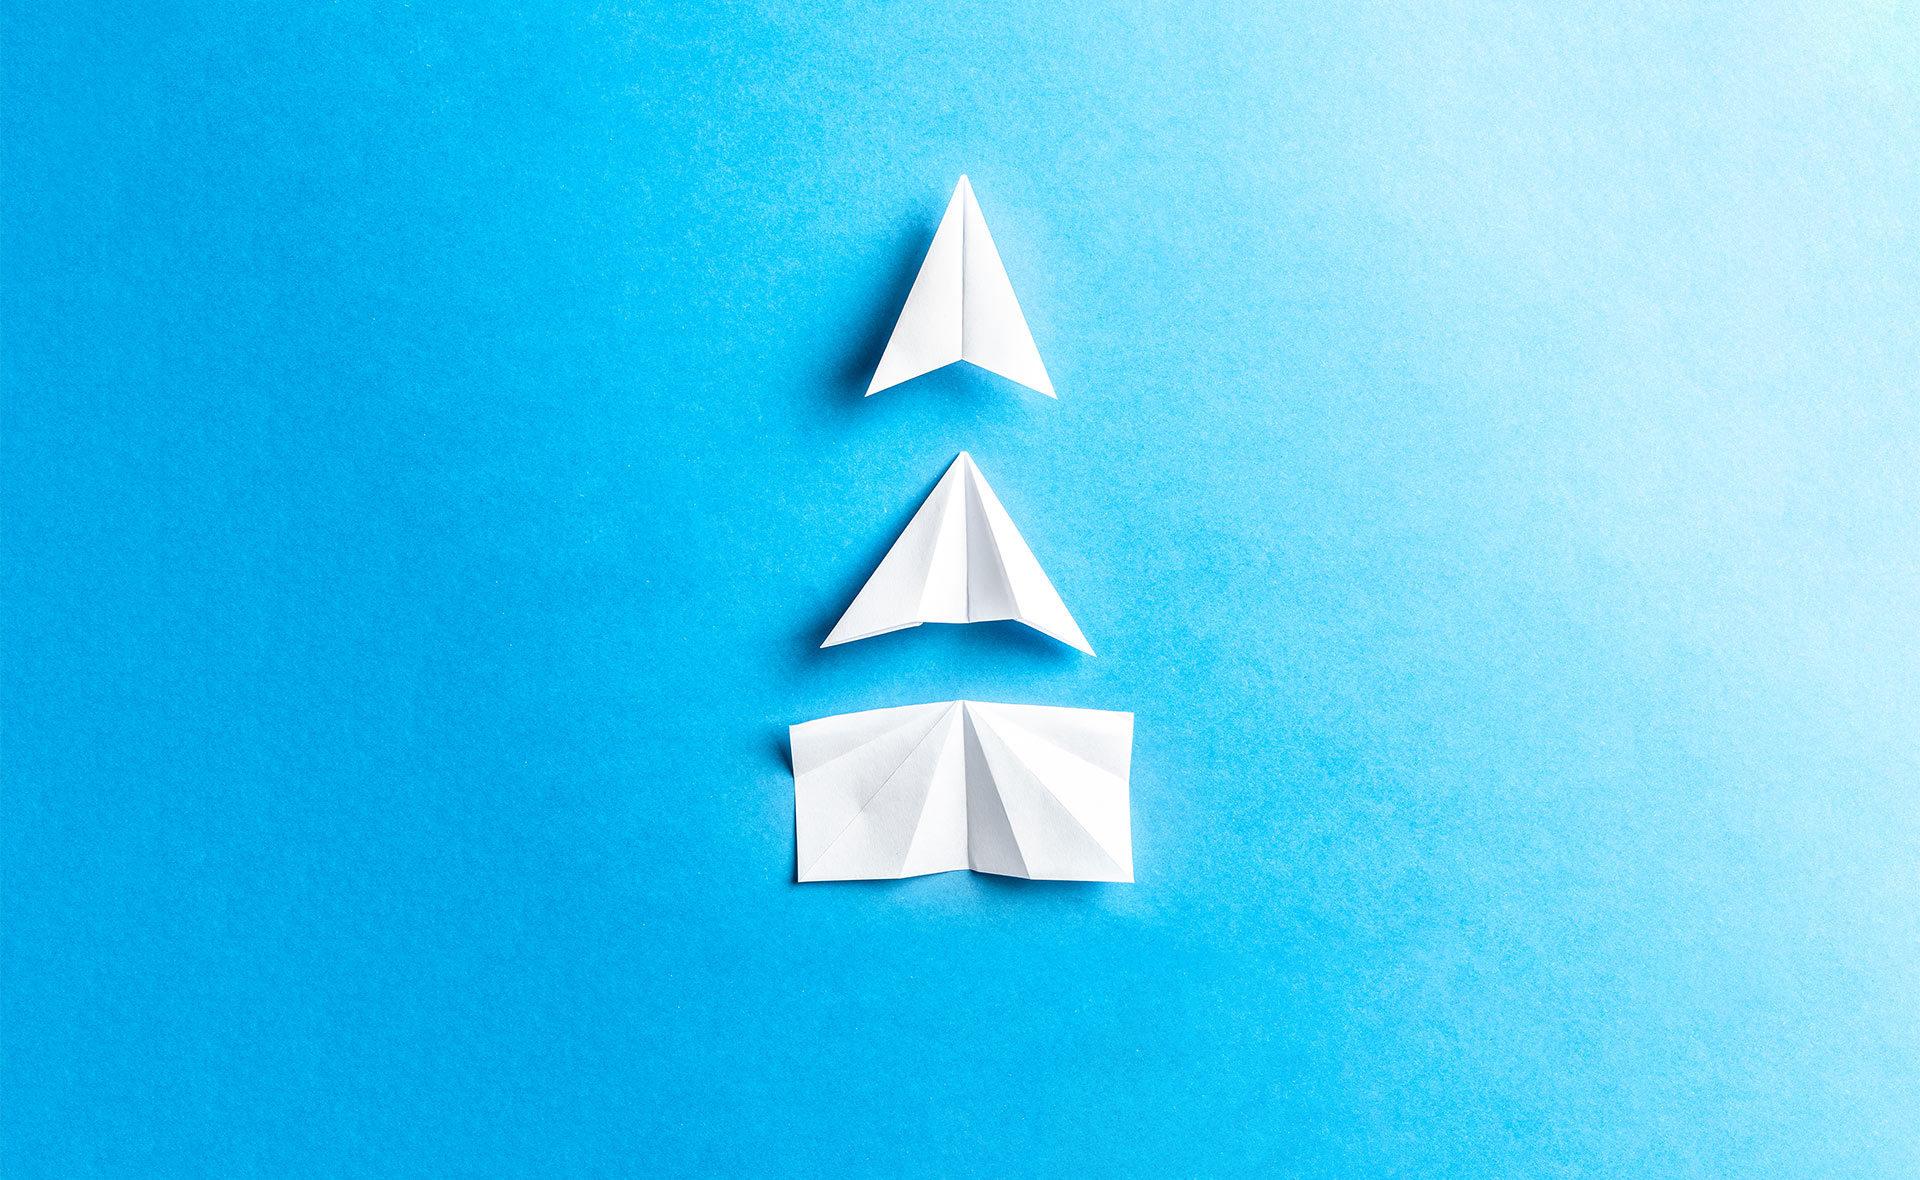 BBVA-informes-cambio-climatico-barcos-papel